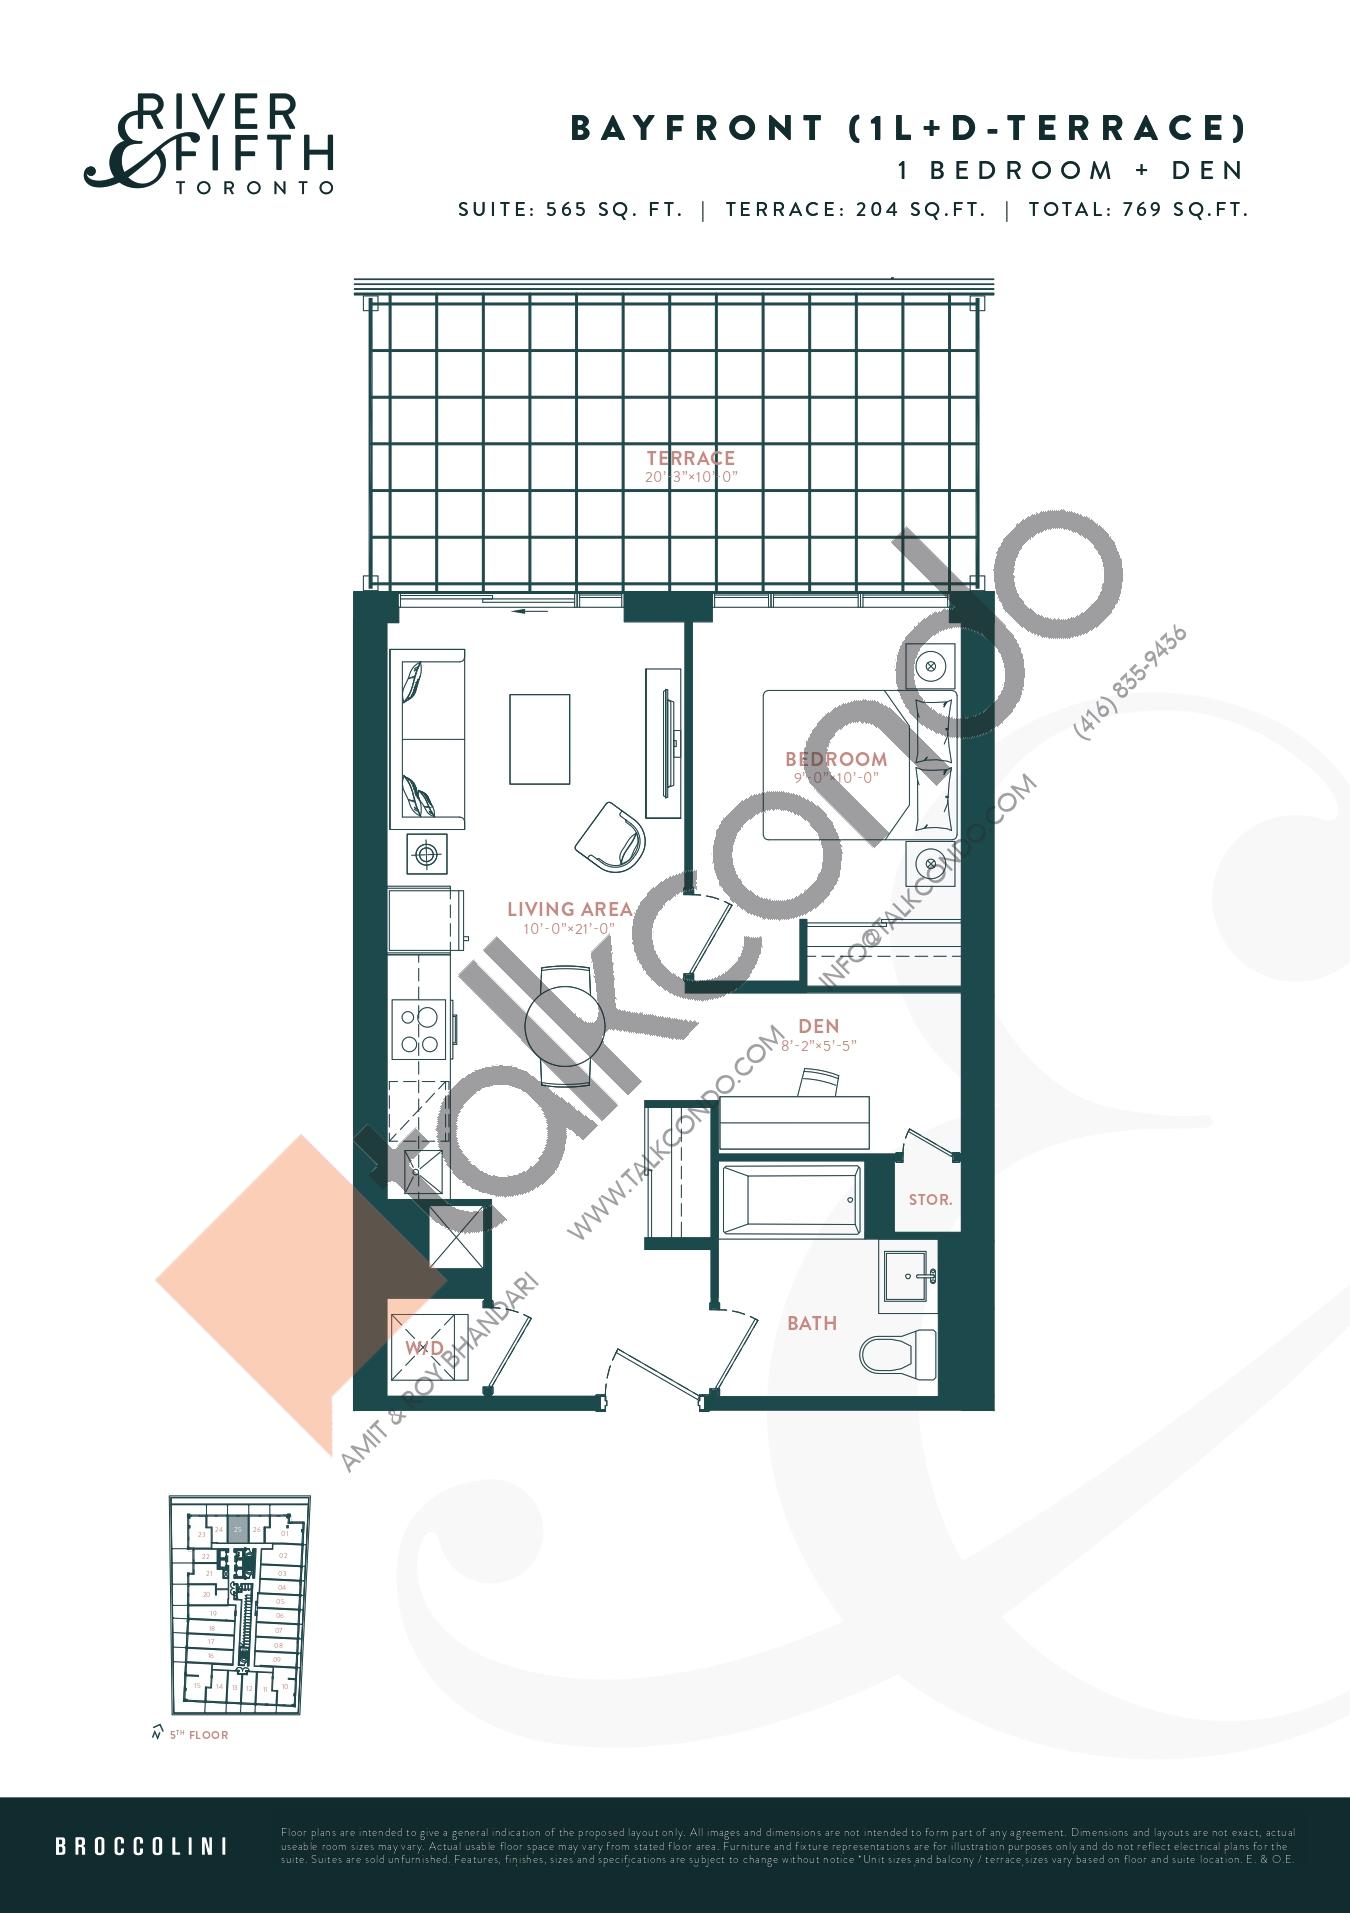 Bayfront (1L+D-Terrace) Floor Plan at River & Fifth Condos - 565 sq.ft